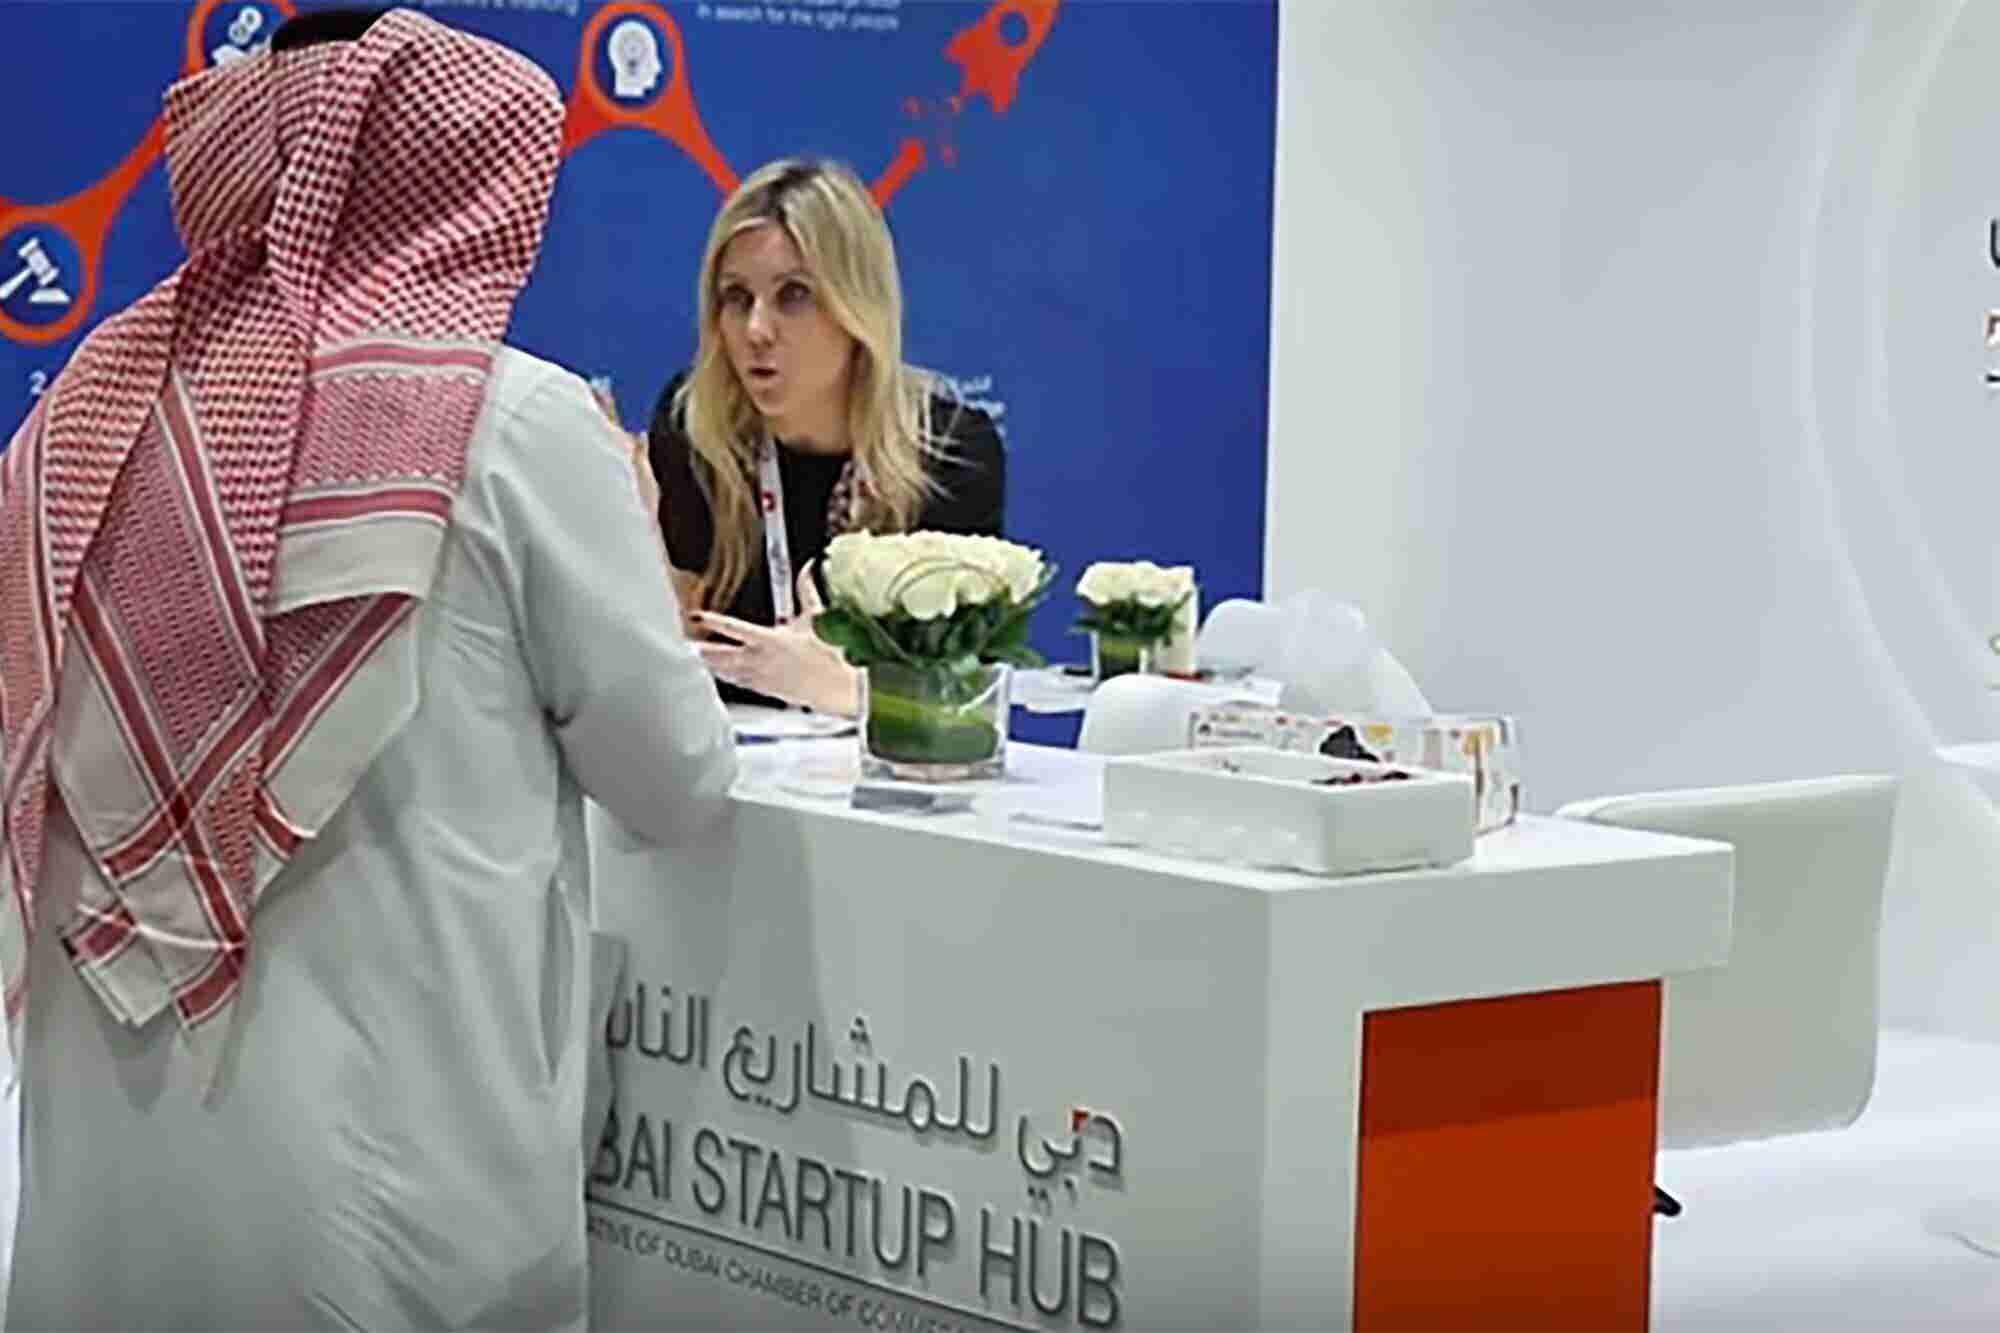 Dubai Startup Hub Brings Startups To Exhibit At GITEX Future Stars 2018